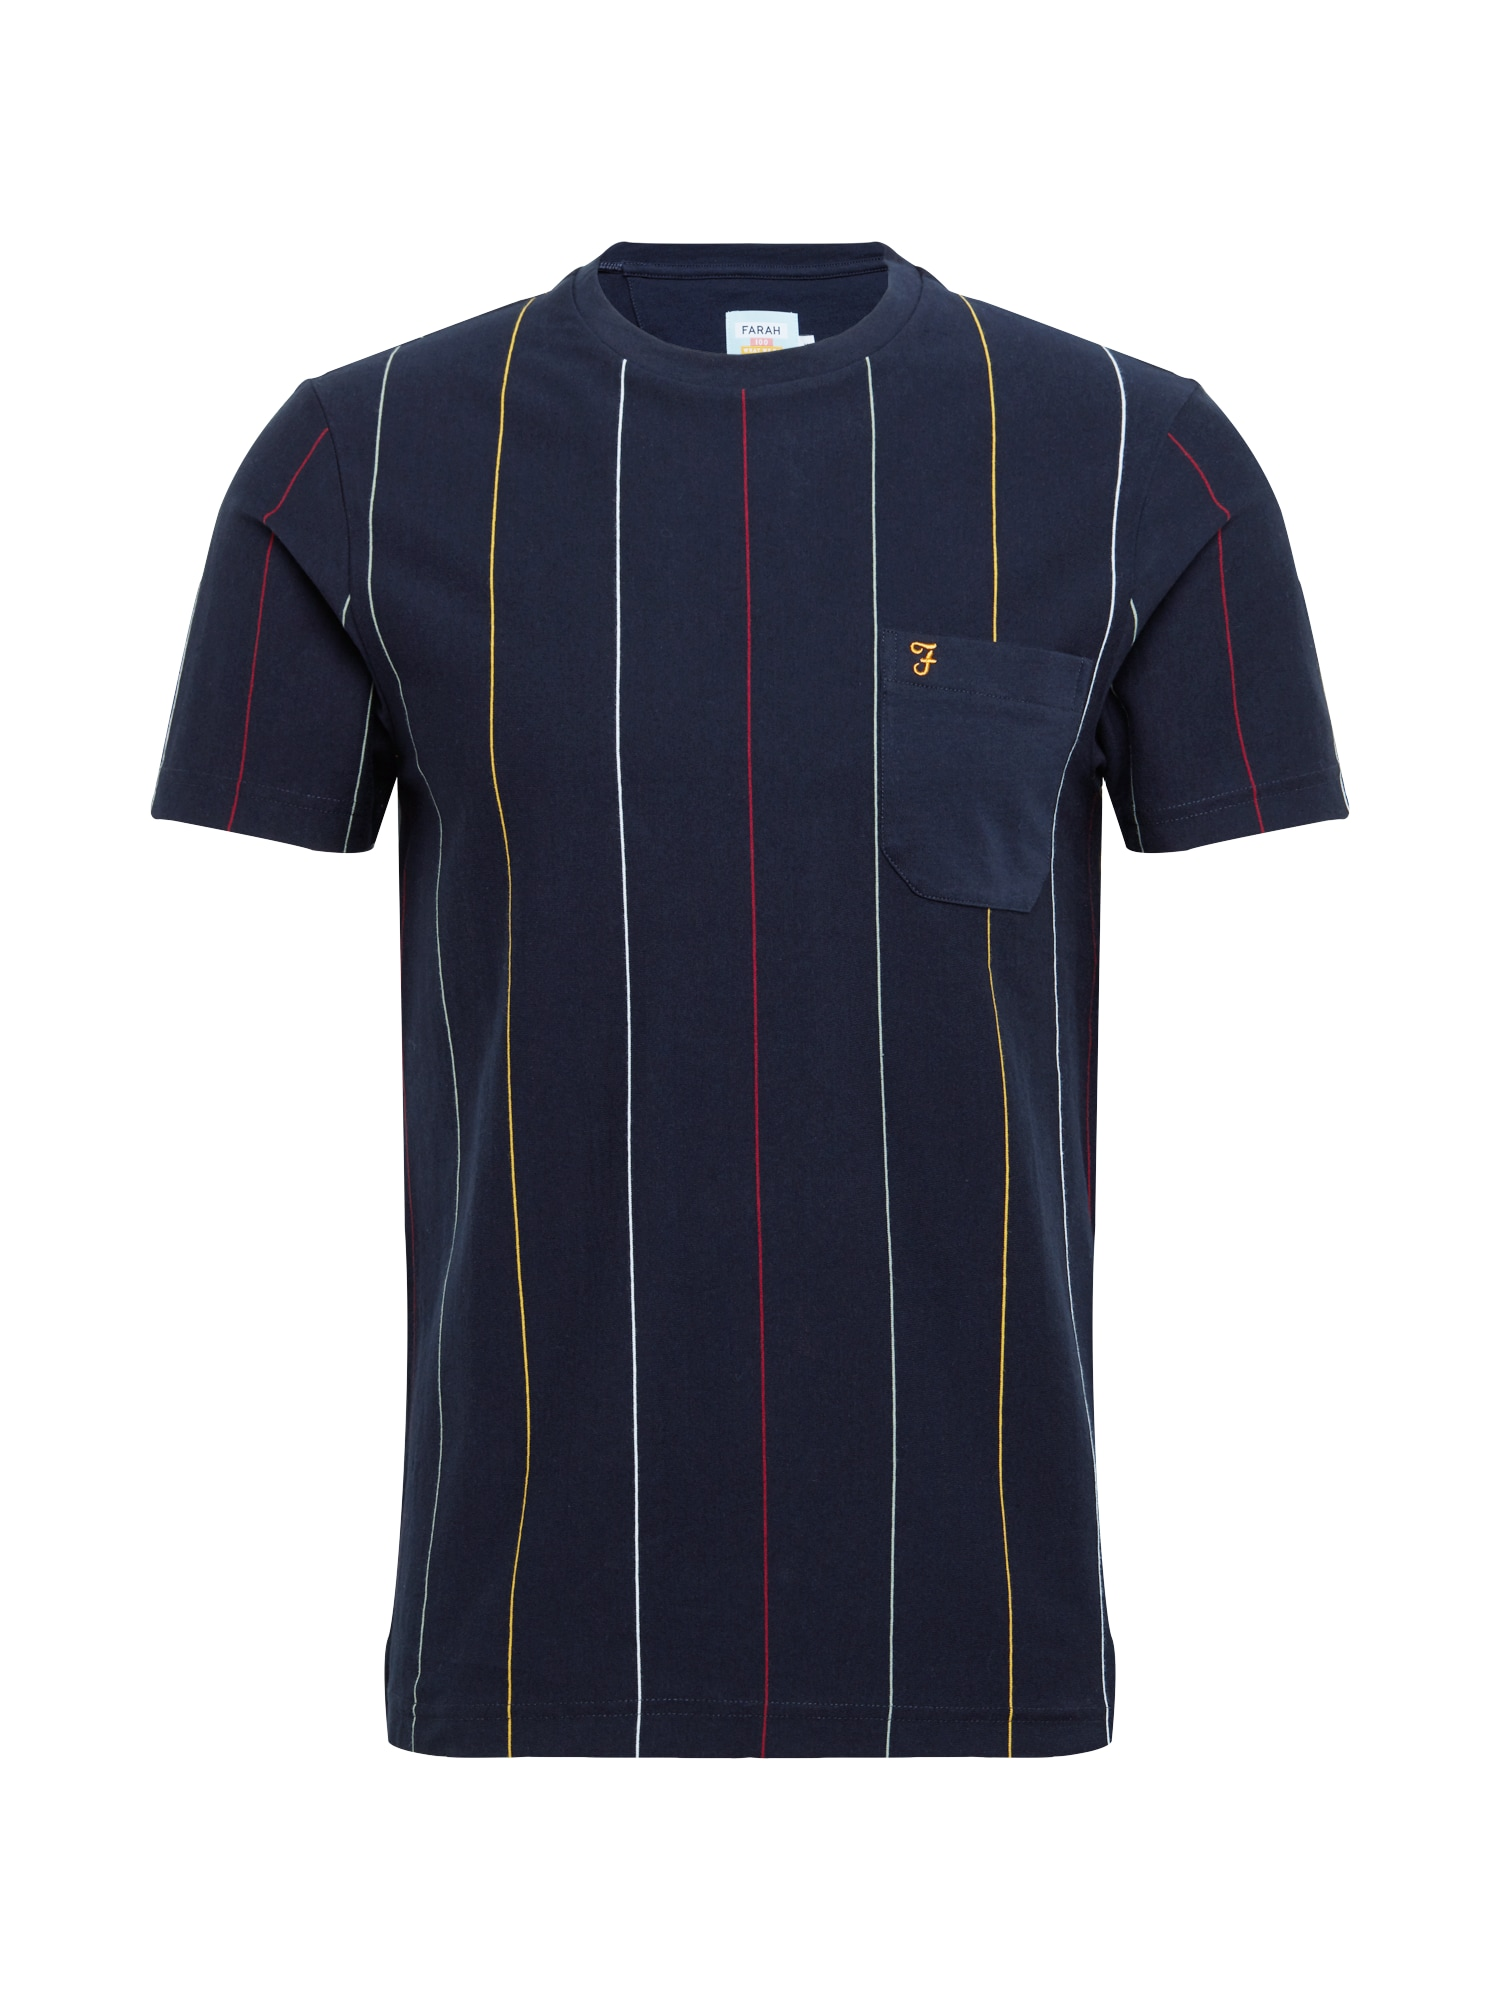 FARAH Tričko 'BINLEY'  námořnická modř / bílá / žlutá / červená